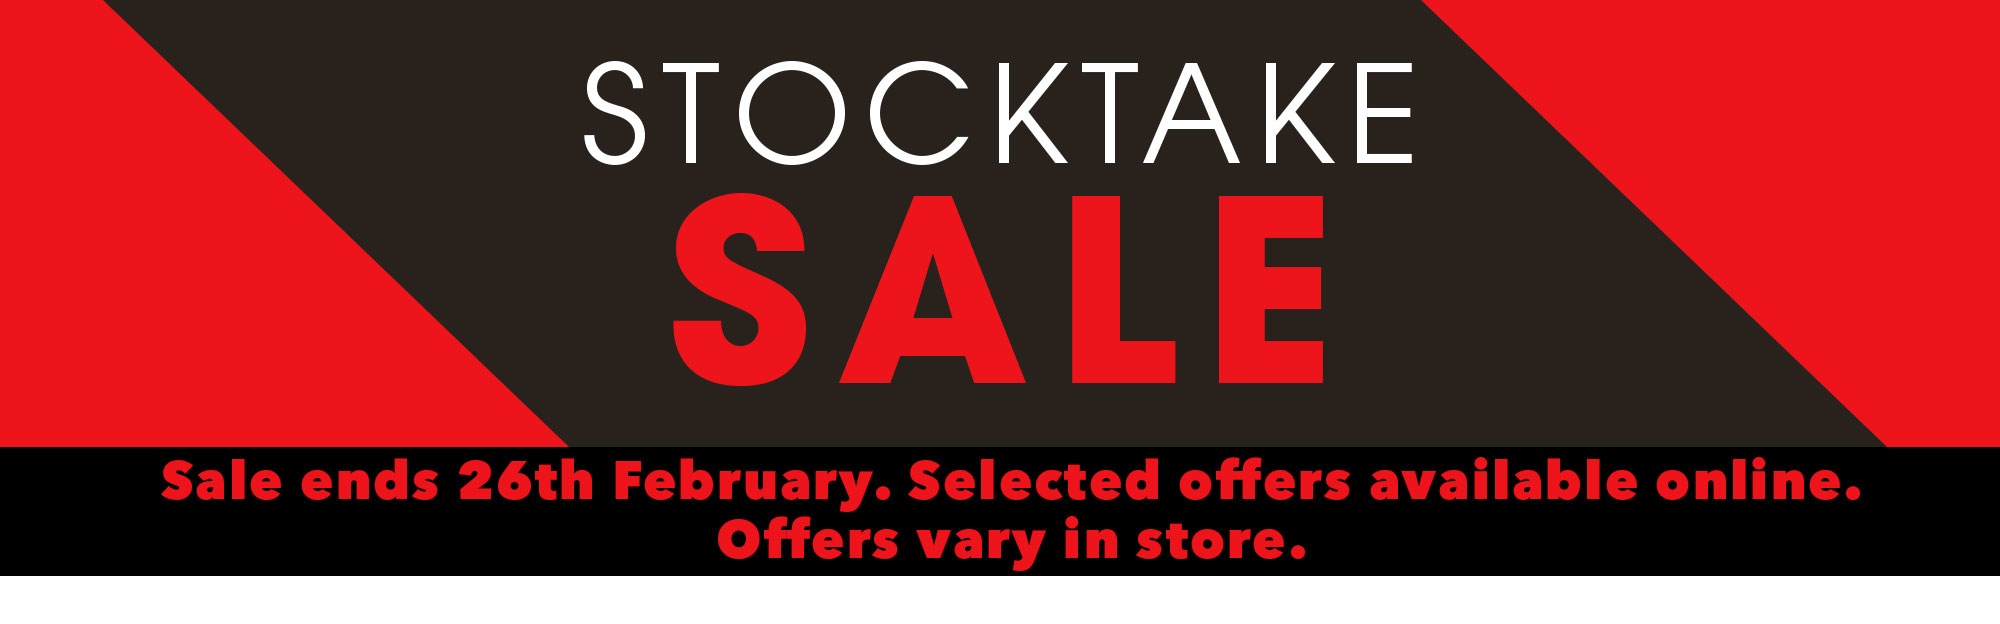 [Stocktake Sale